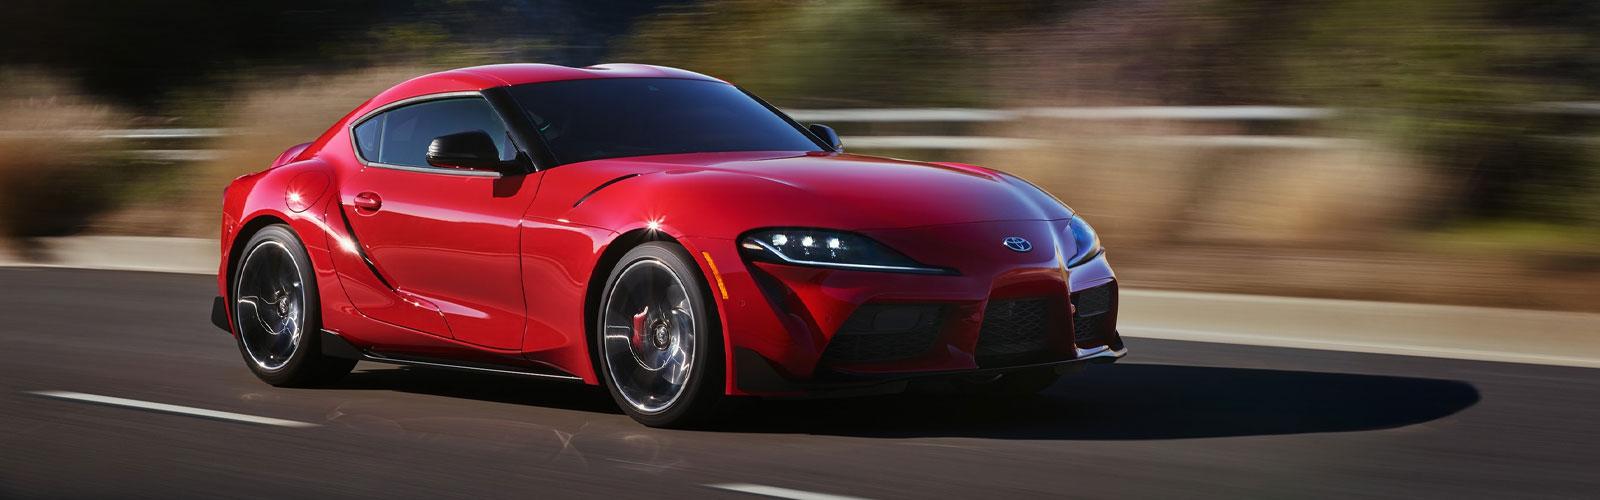 2020 Toyota GR Supra Sports Cars For Sale In Grenada, Mississippi